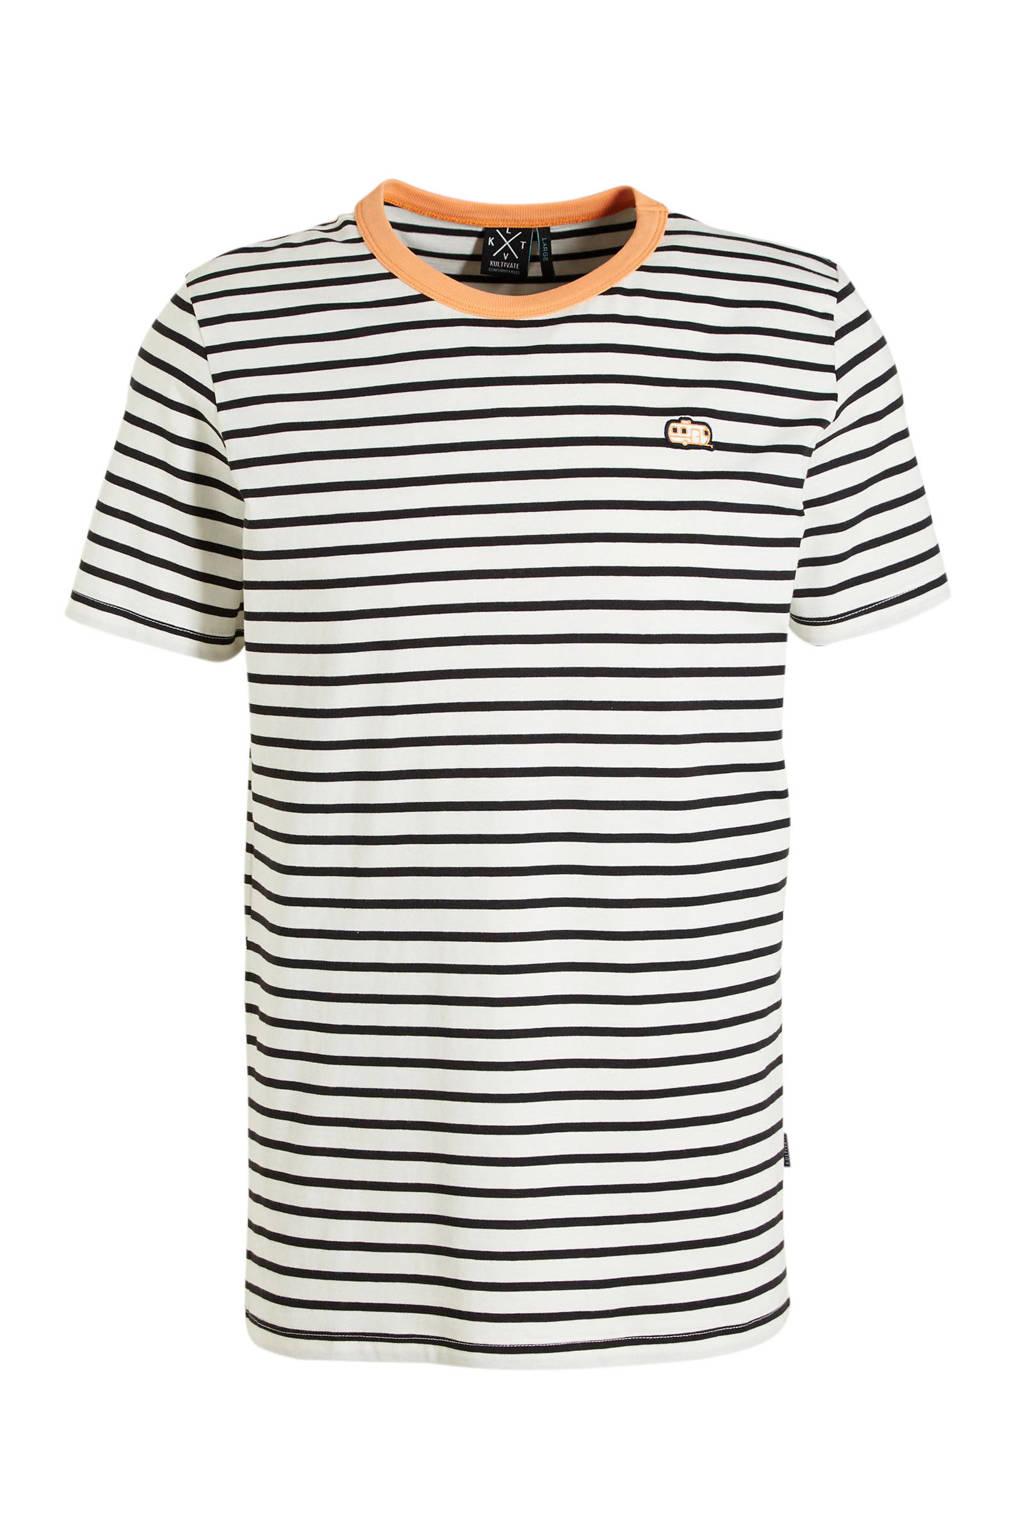 Kultivate gestreept T-shirt ecru, Ecru